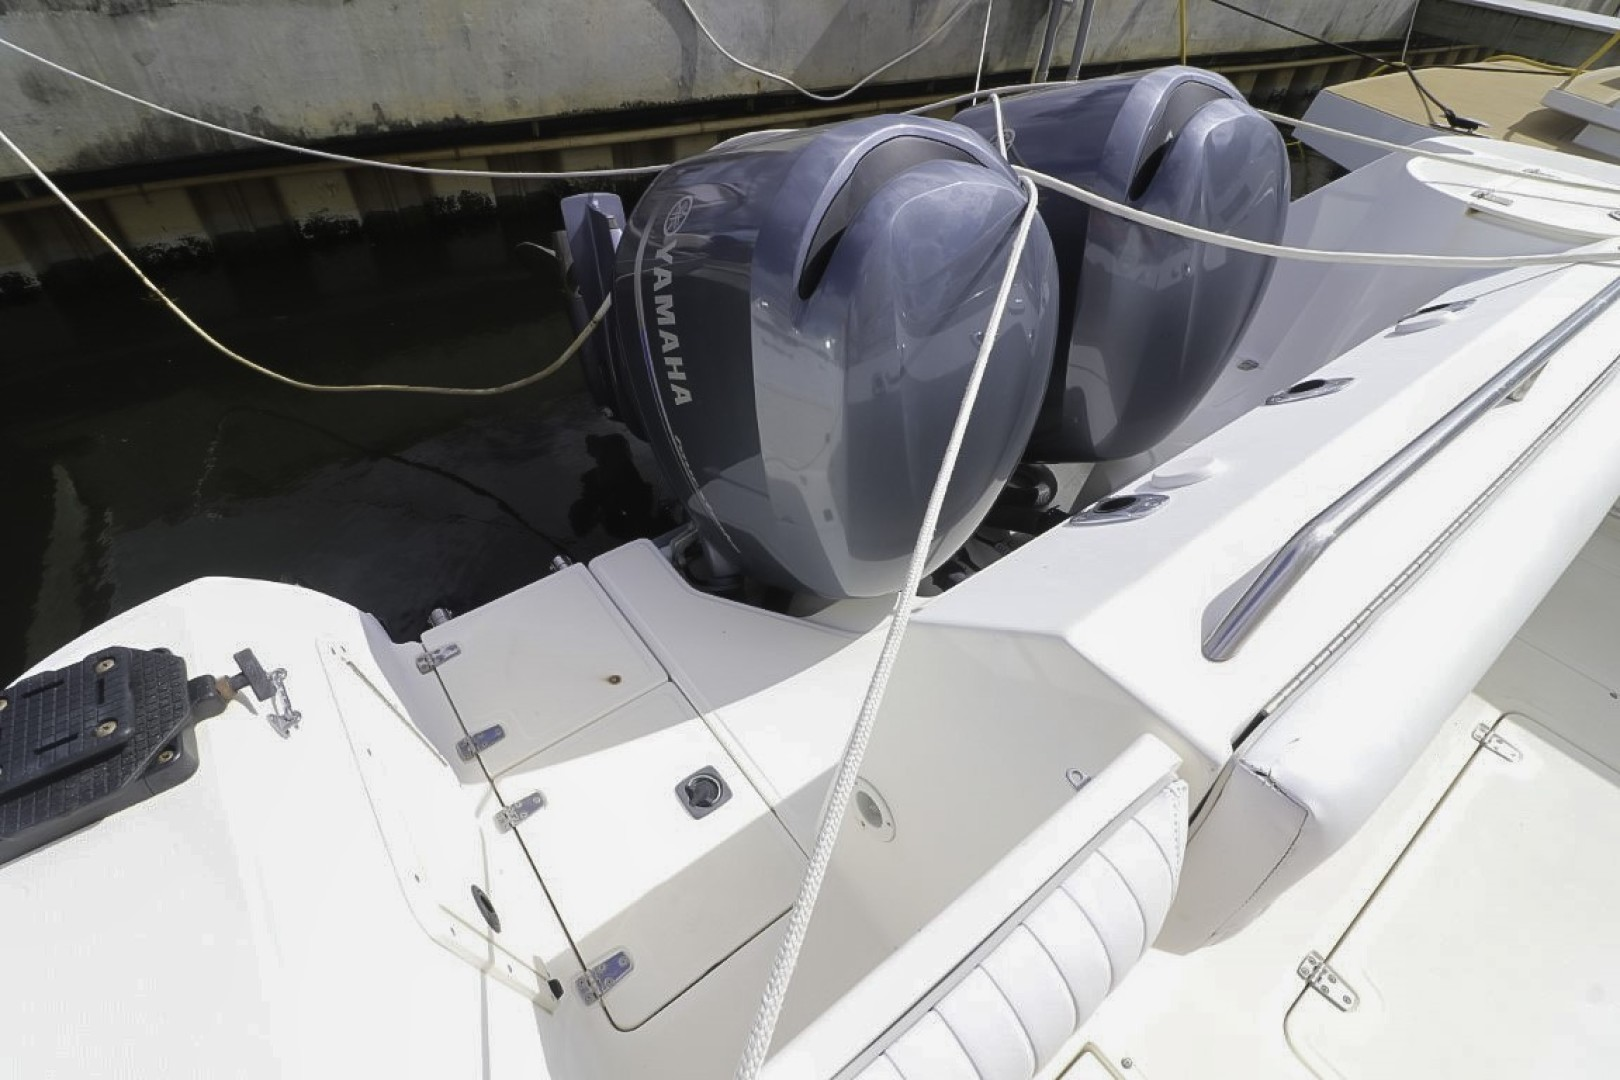 Boston Whaler-280 Outrage 2001 -Fort Lauderdale-Florida-United States-1566078 | Thumbnail